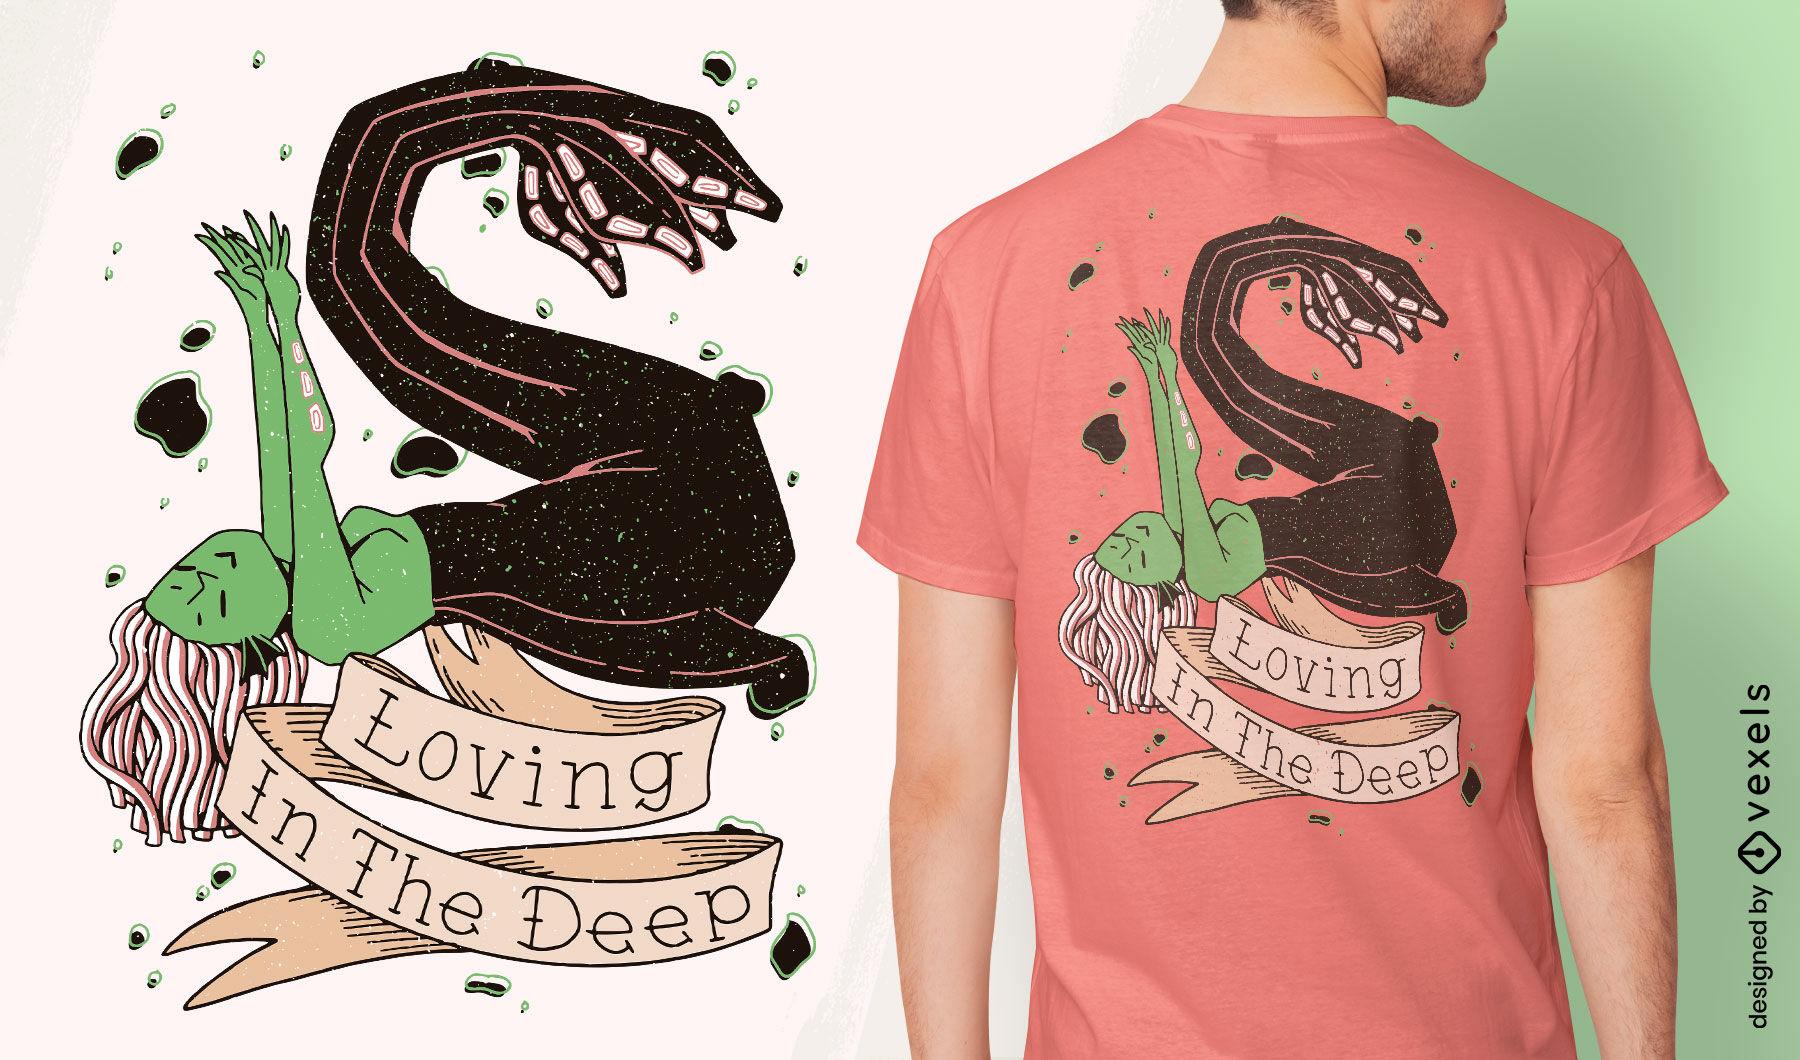 Mermaid creepy sea creature t-shirt design